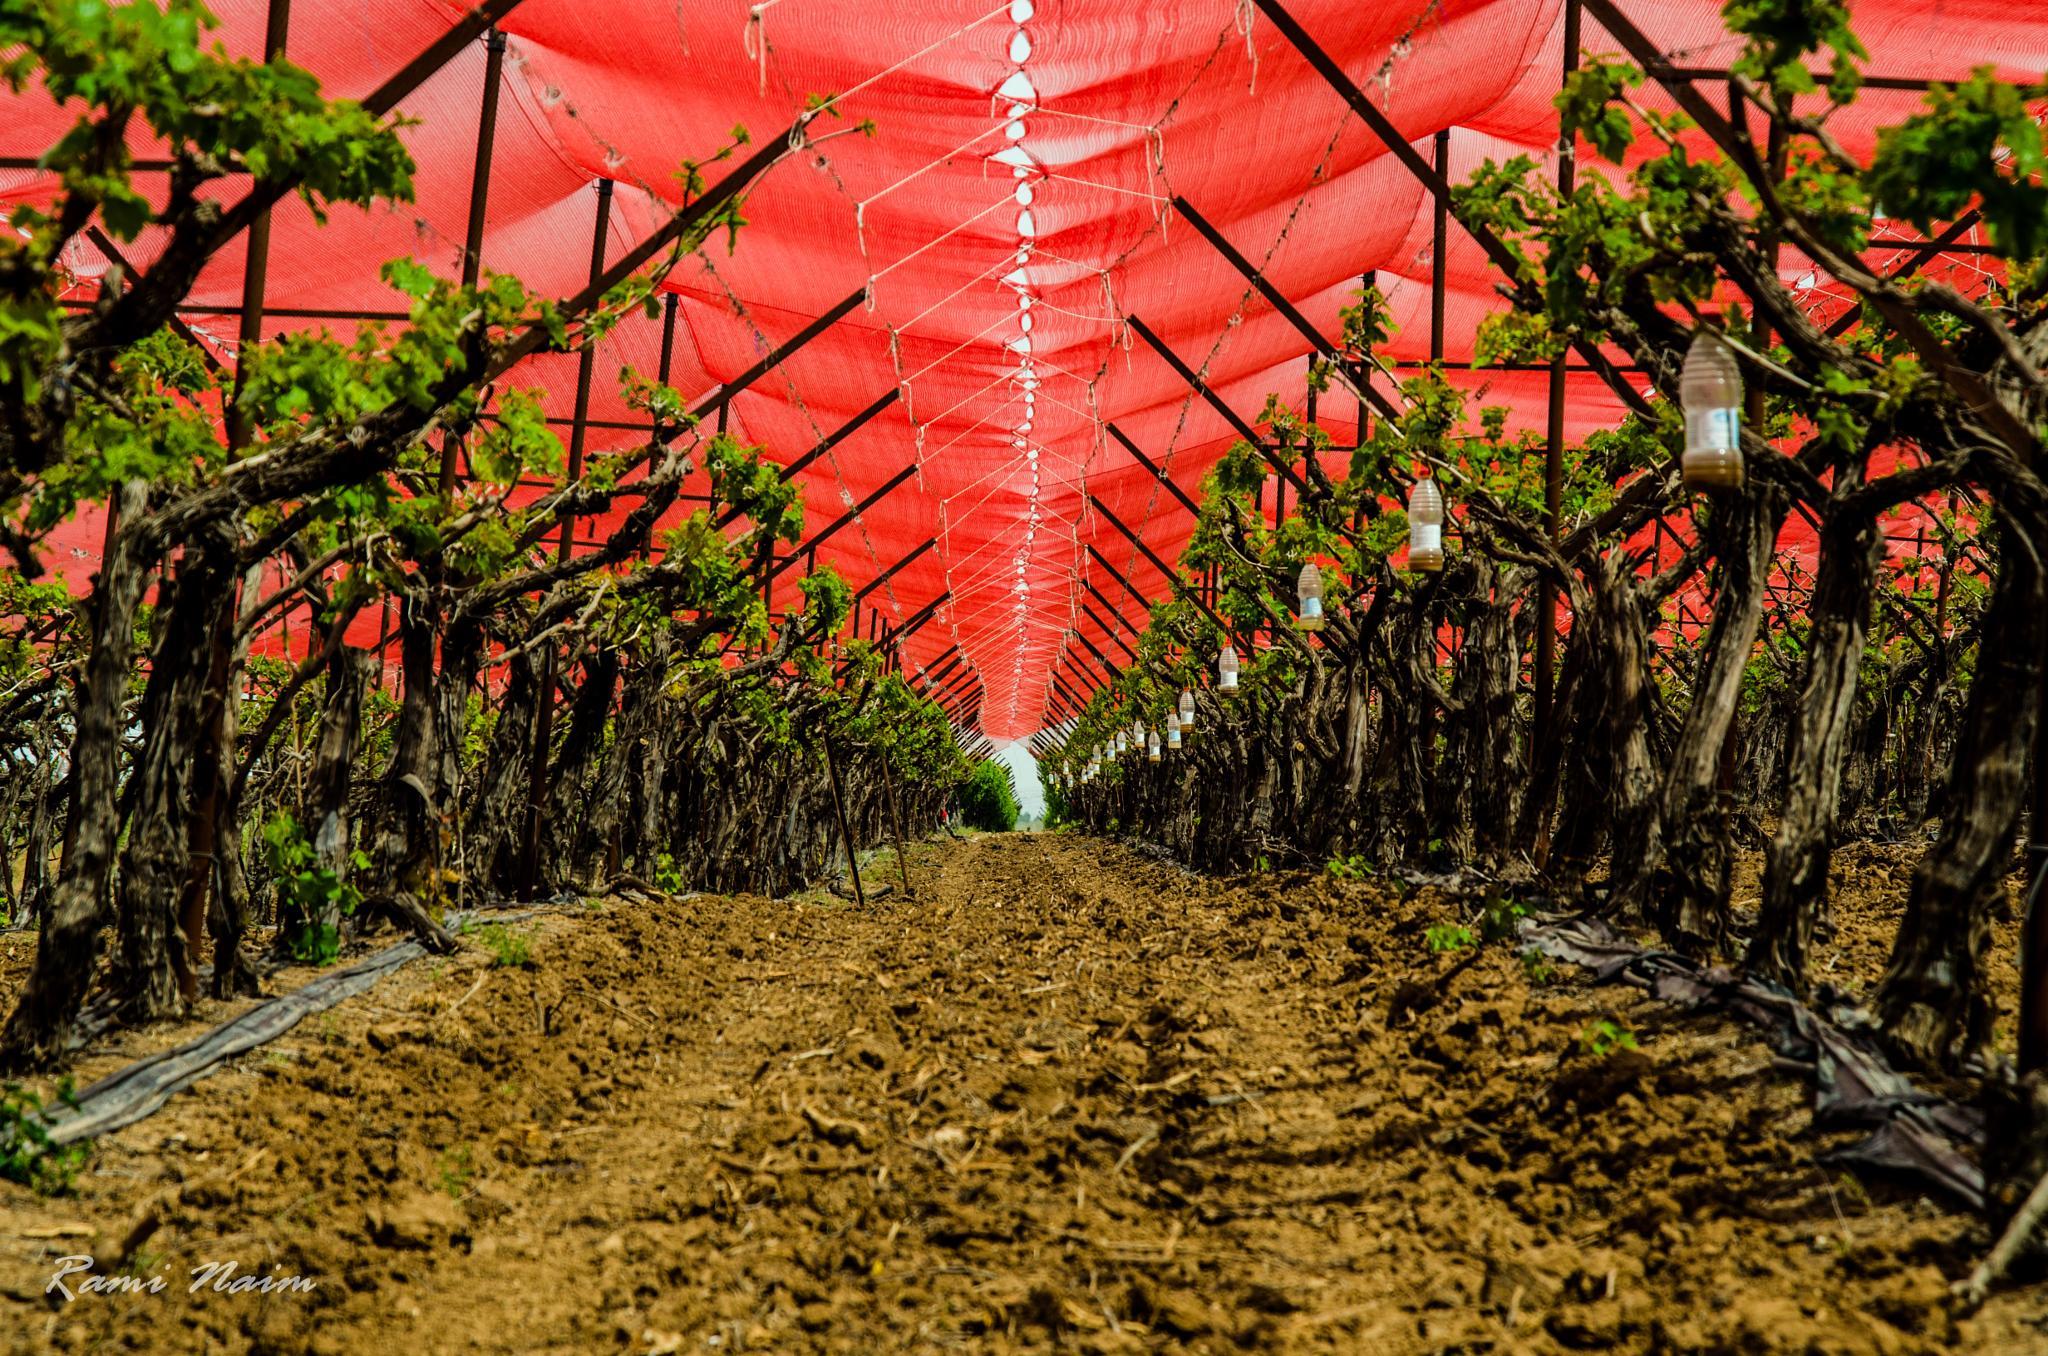 Young Vineyard by raminaim